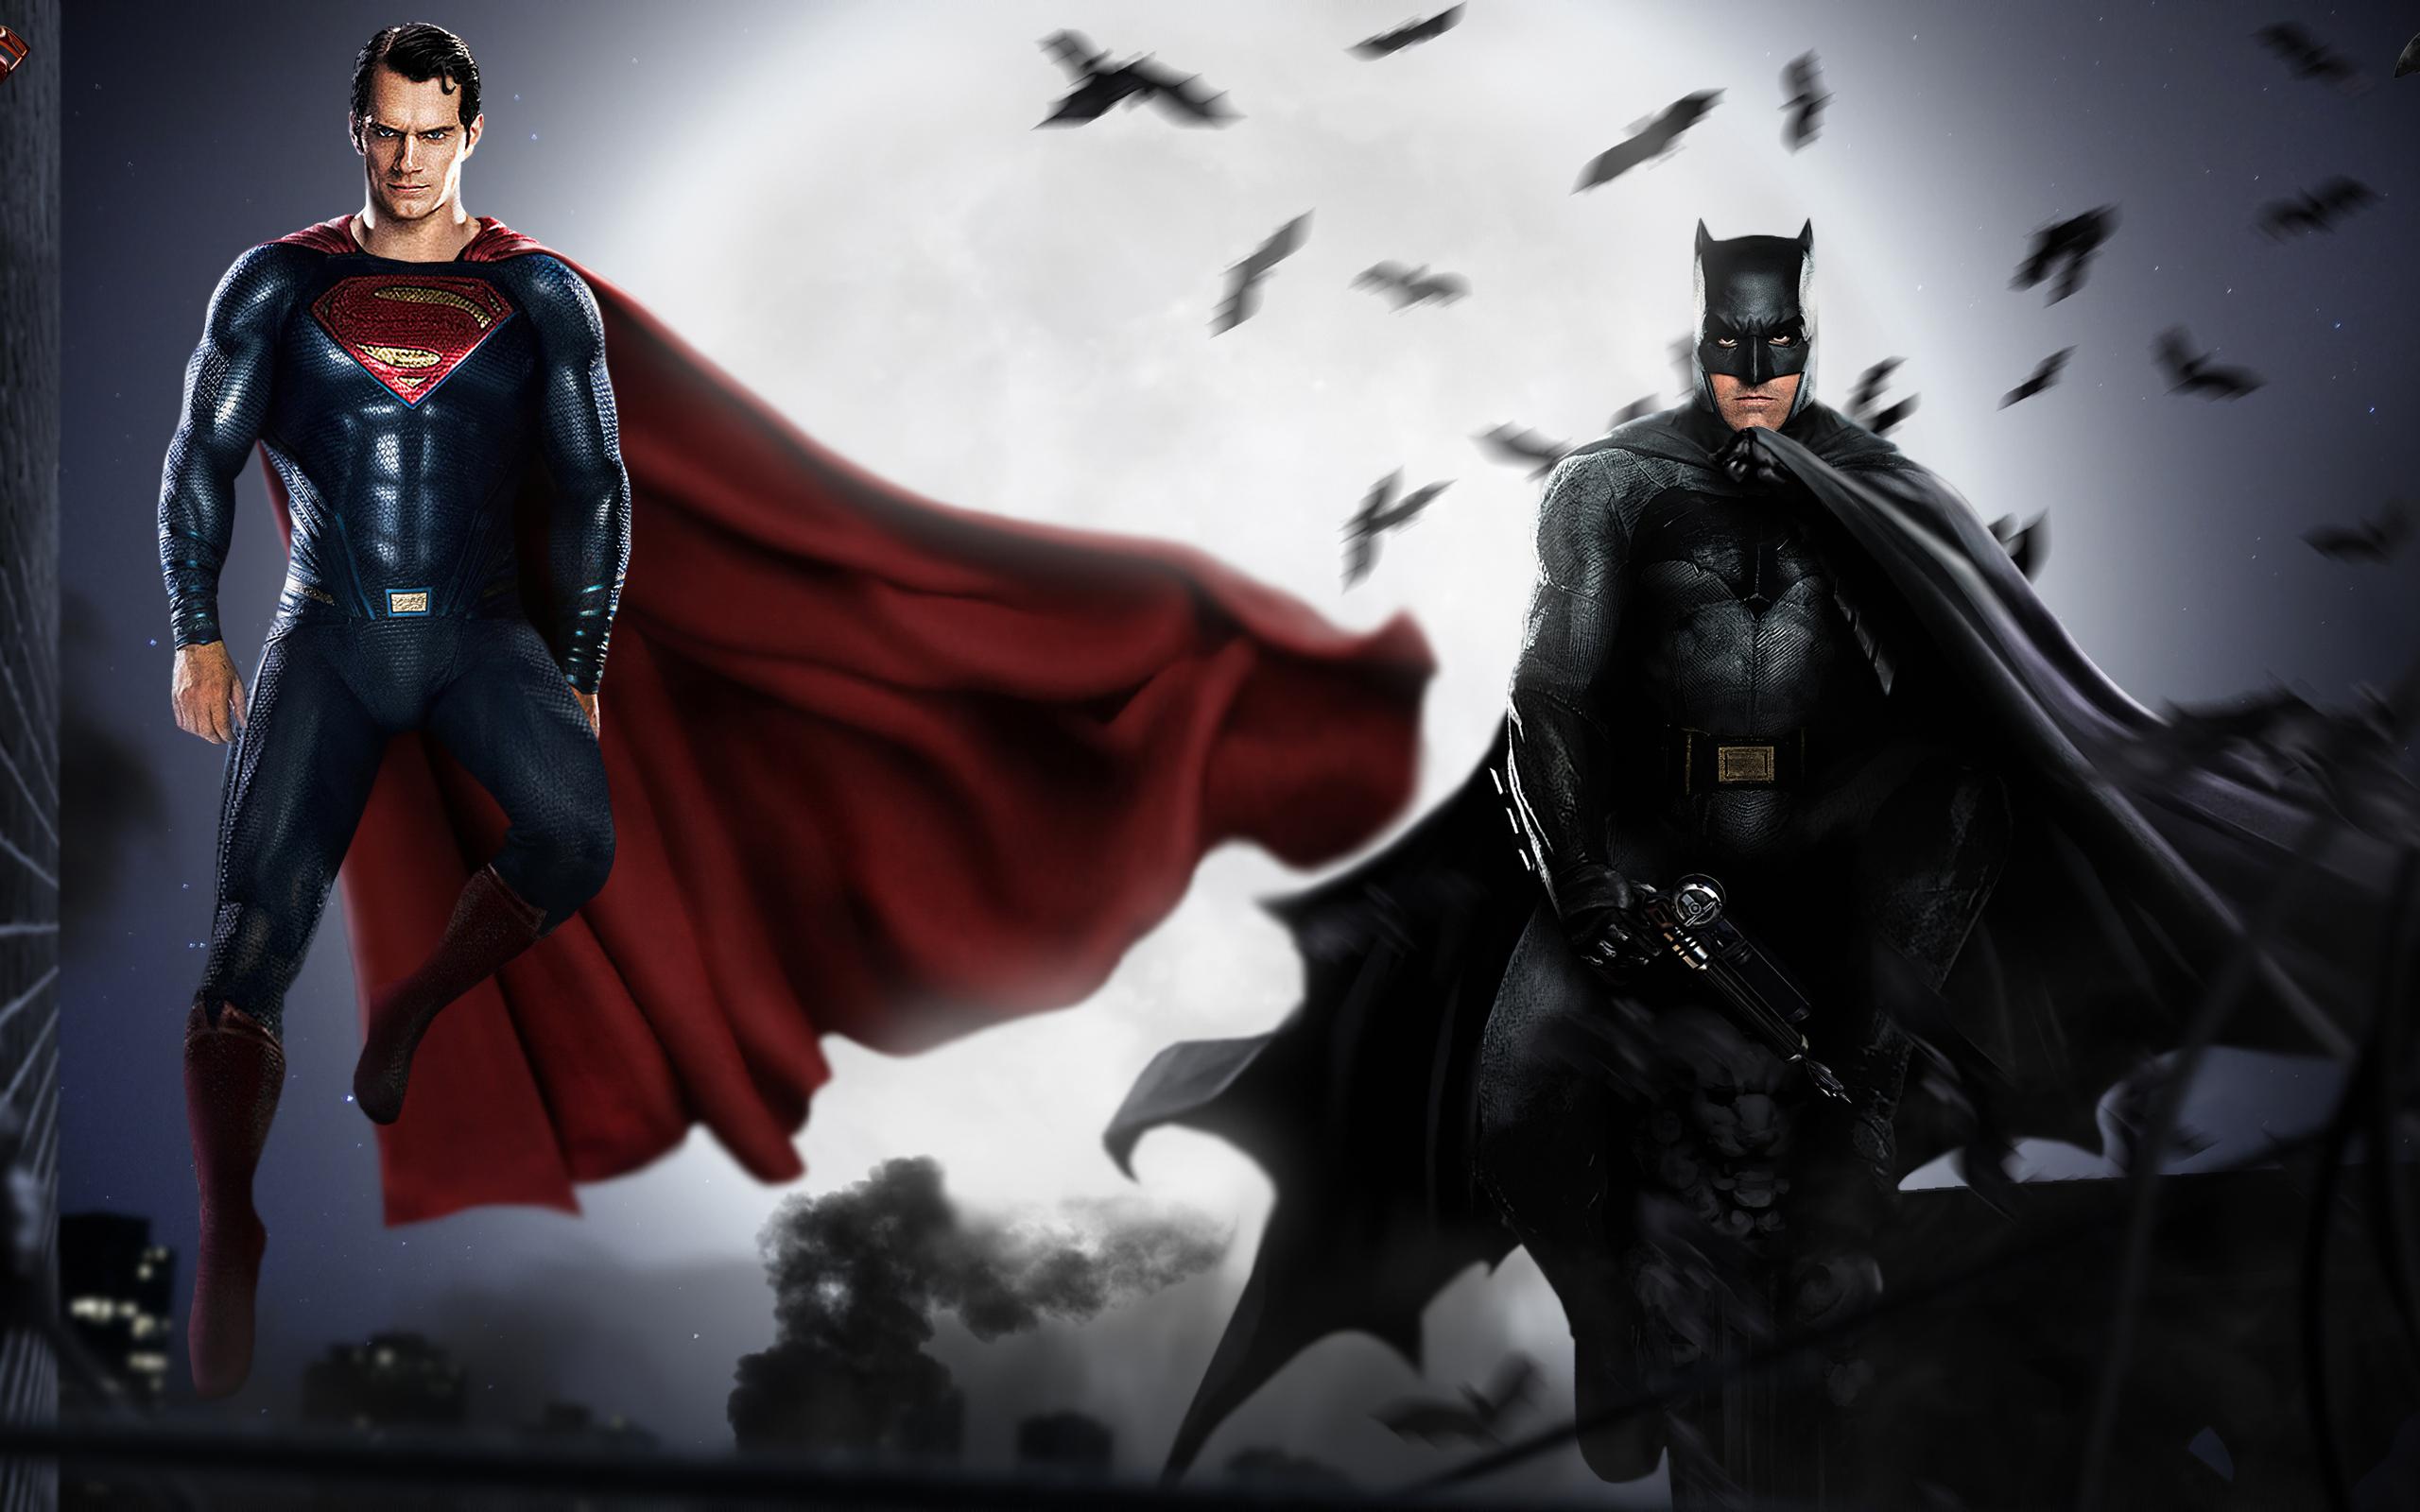 batman-super-man-4k-jd.jpg